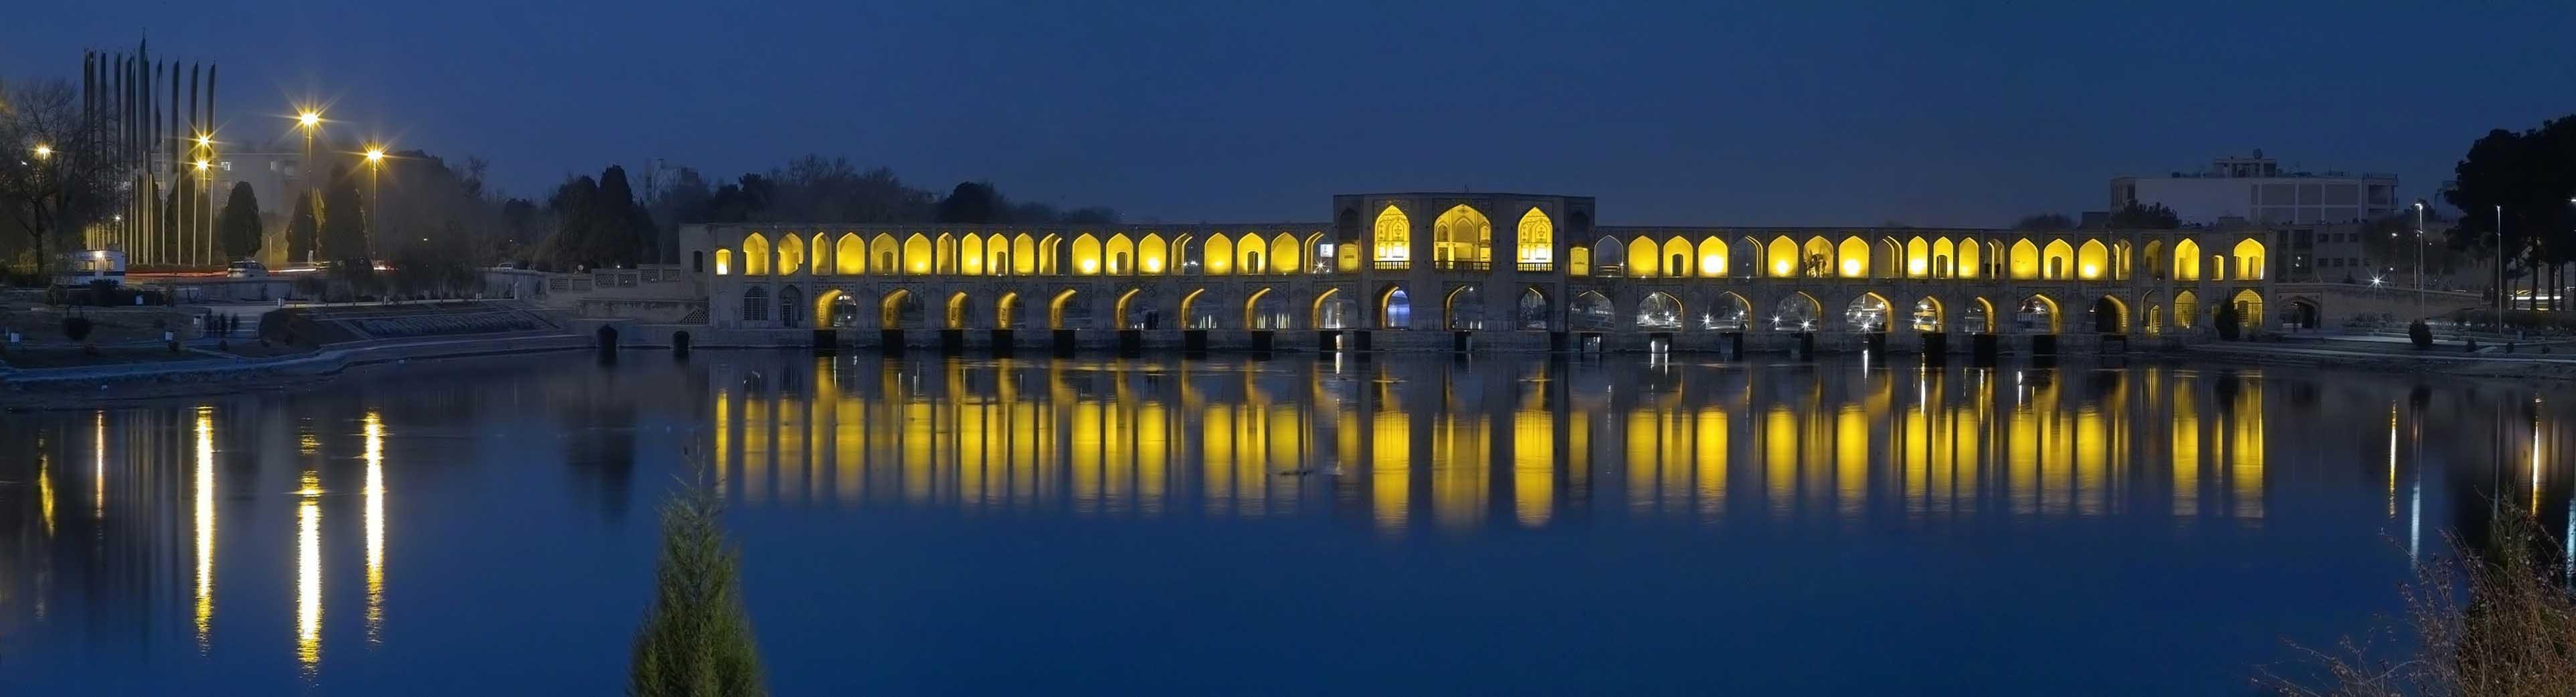 Free stock photo of Iran - Esfehan 2001